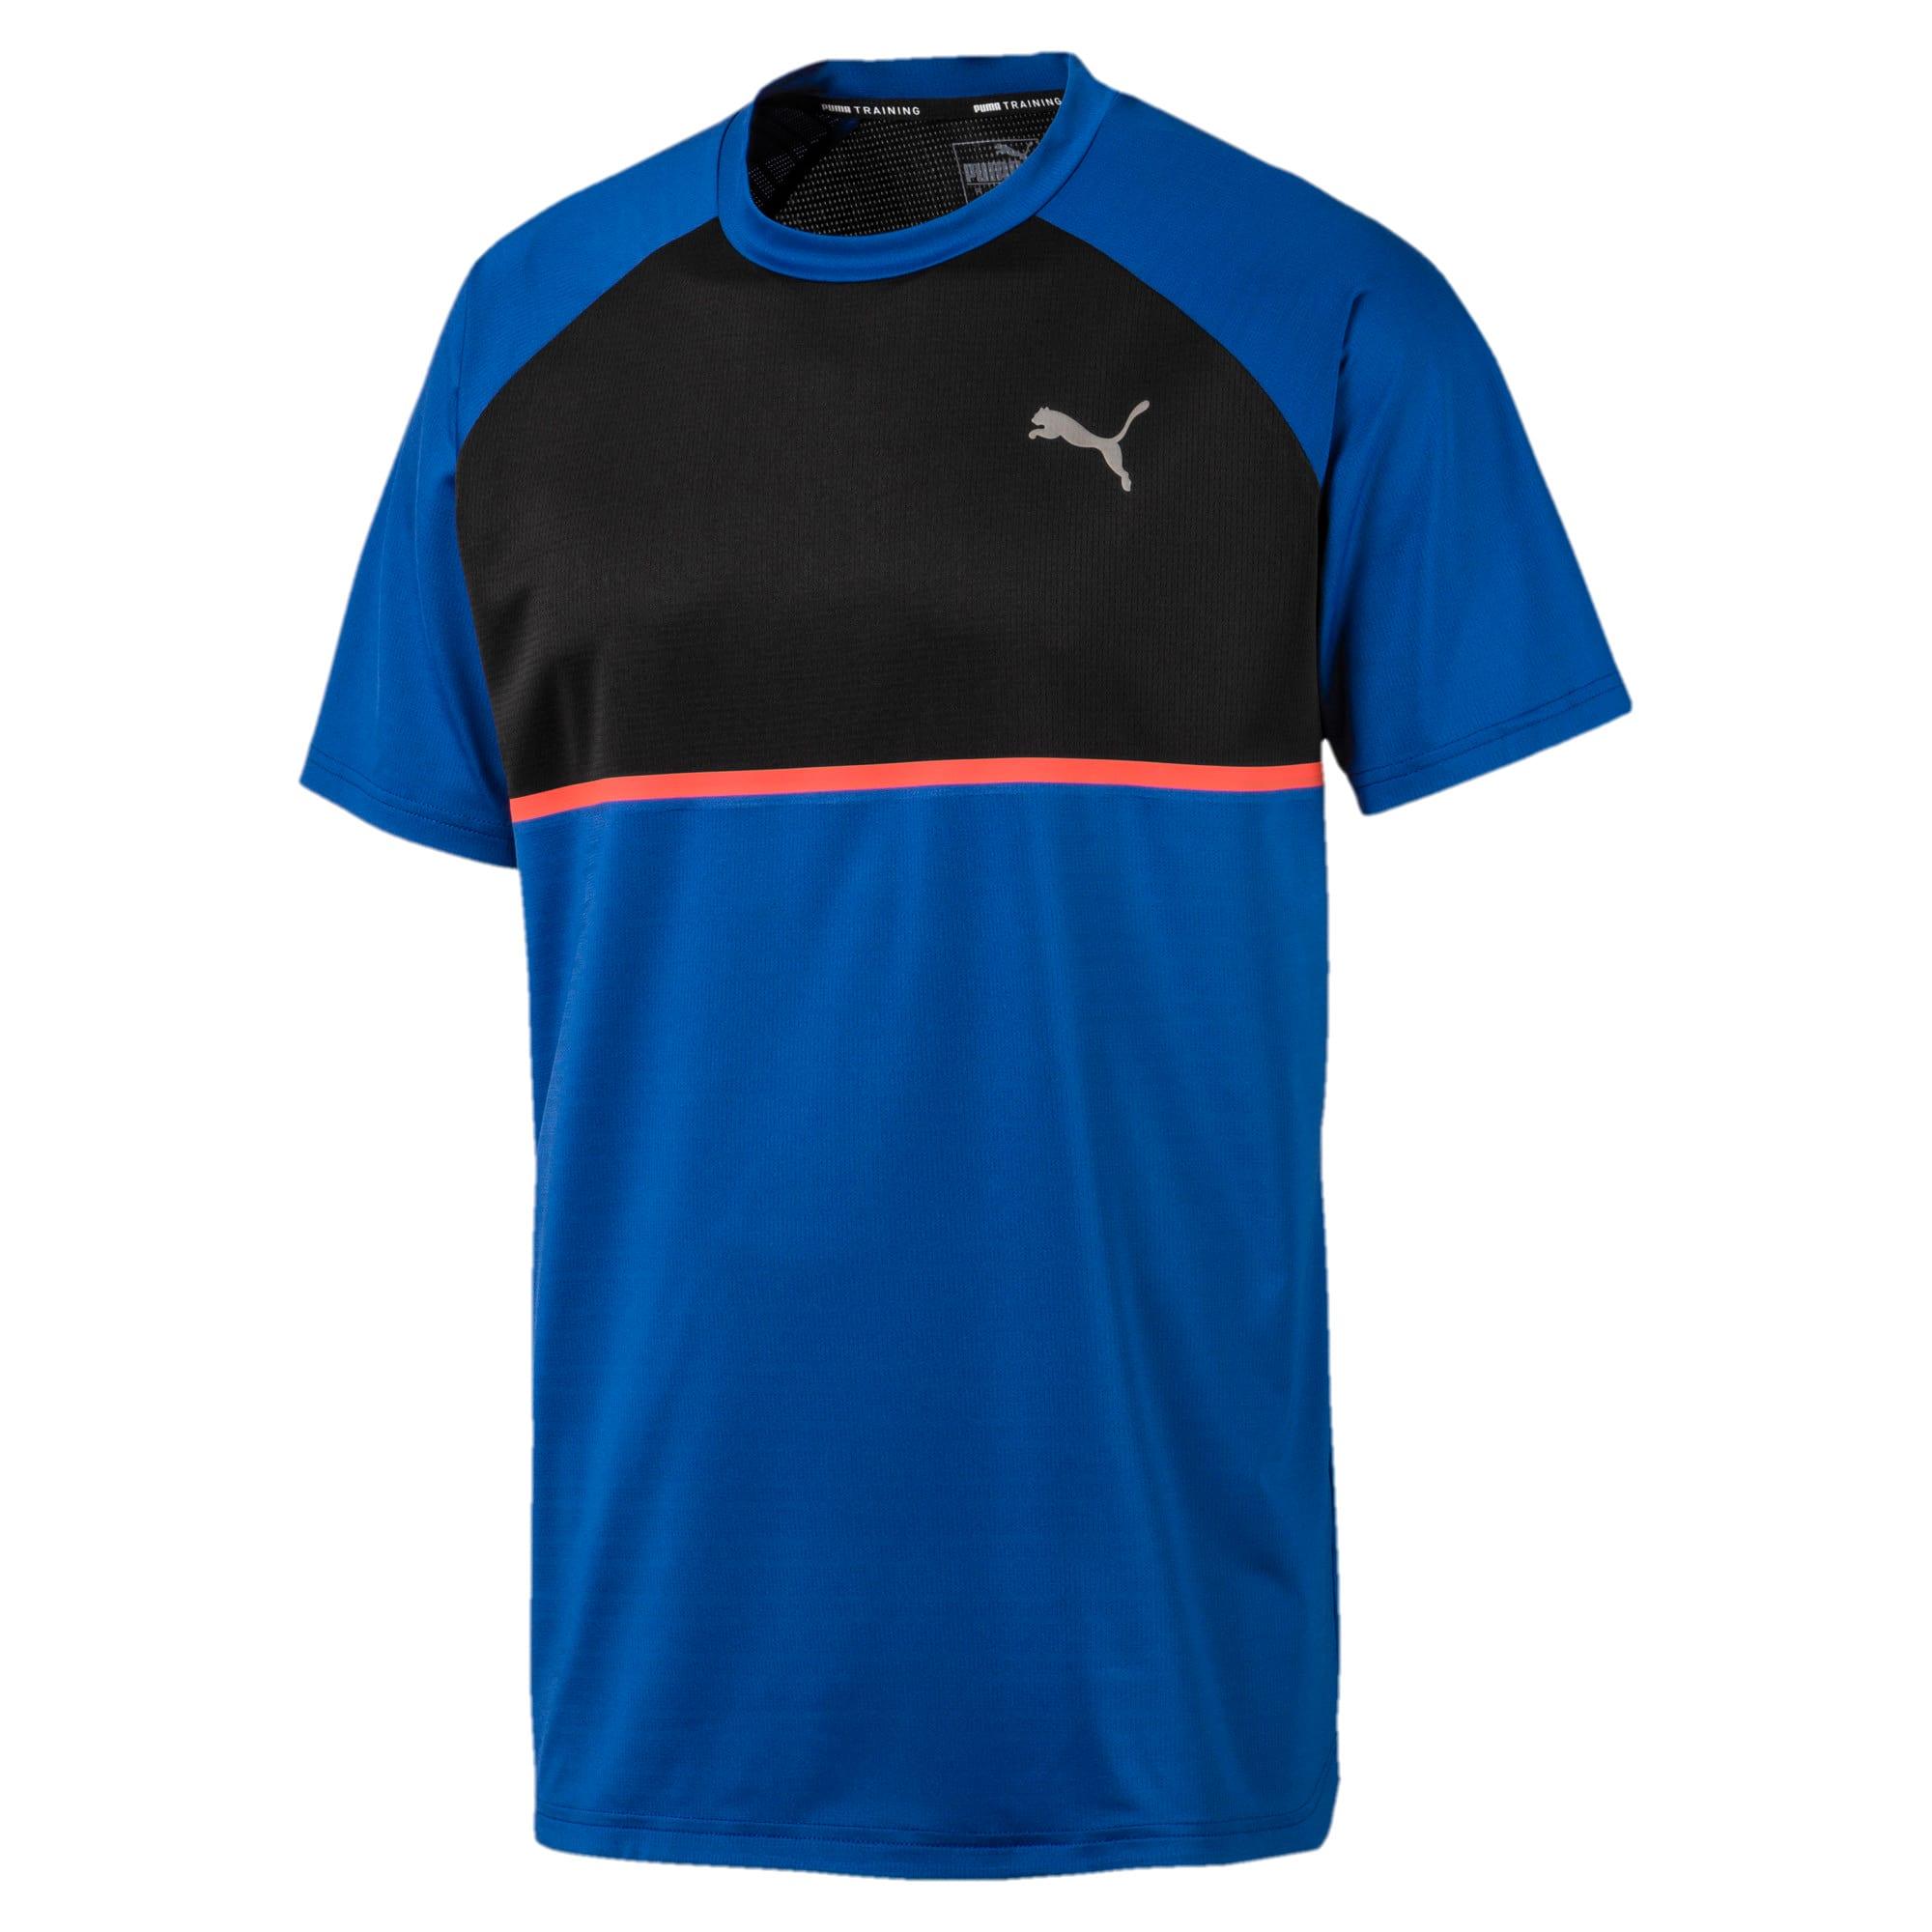 Thumbnail 4 of Power BND T-shirt voor heren, Galaxy Blue-Puma Black, medium